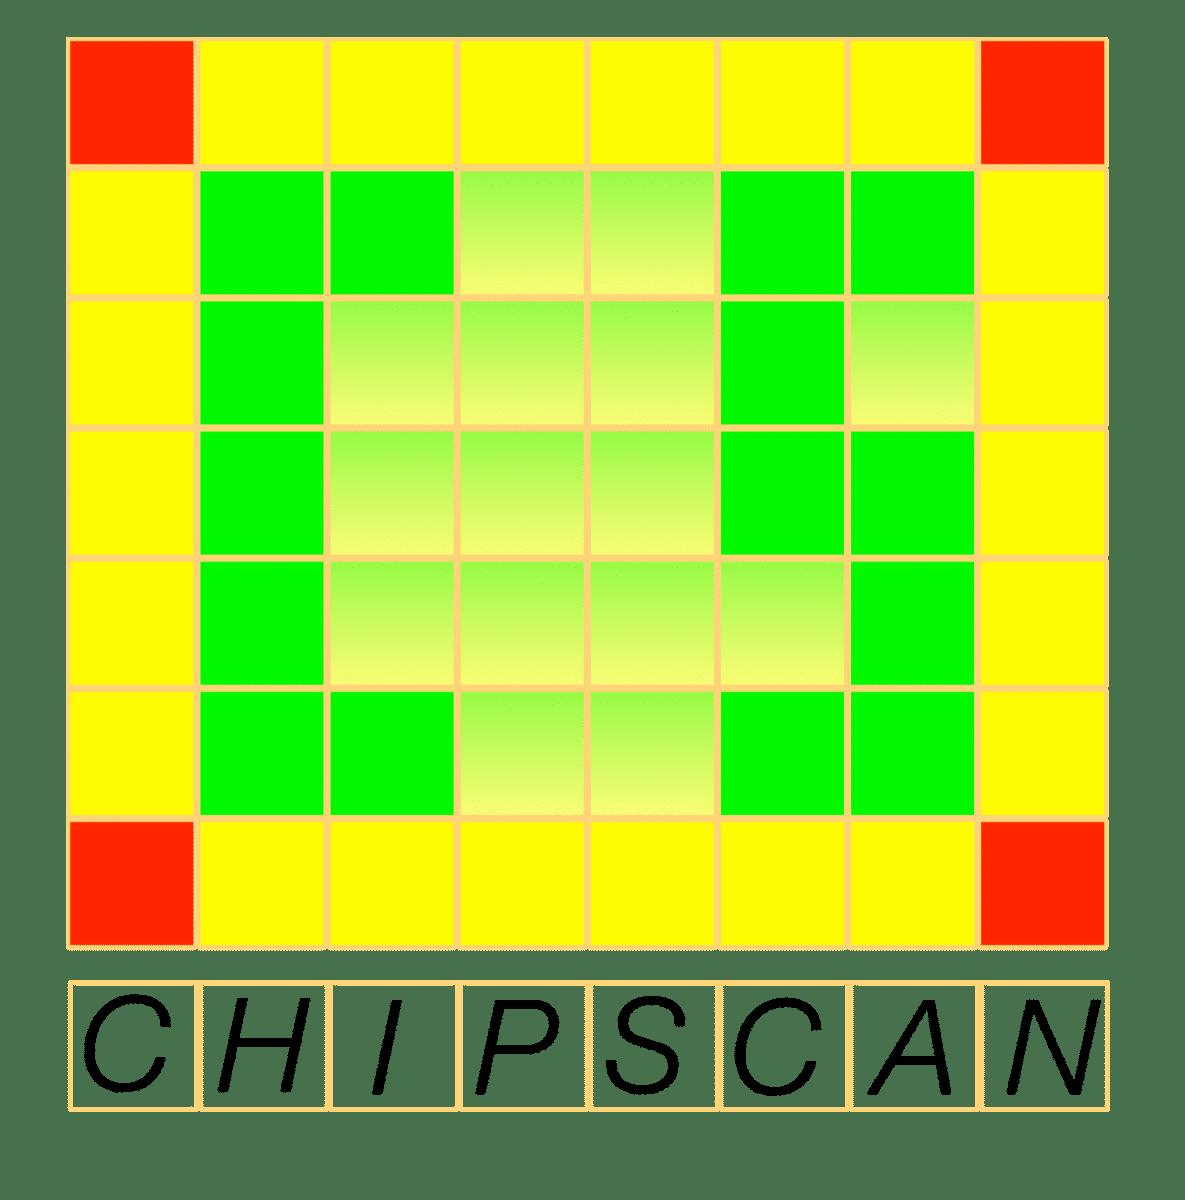 Chip Scan